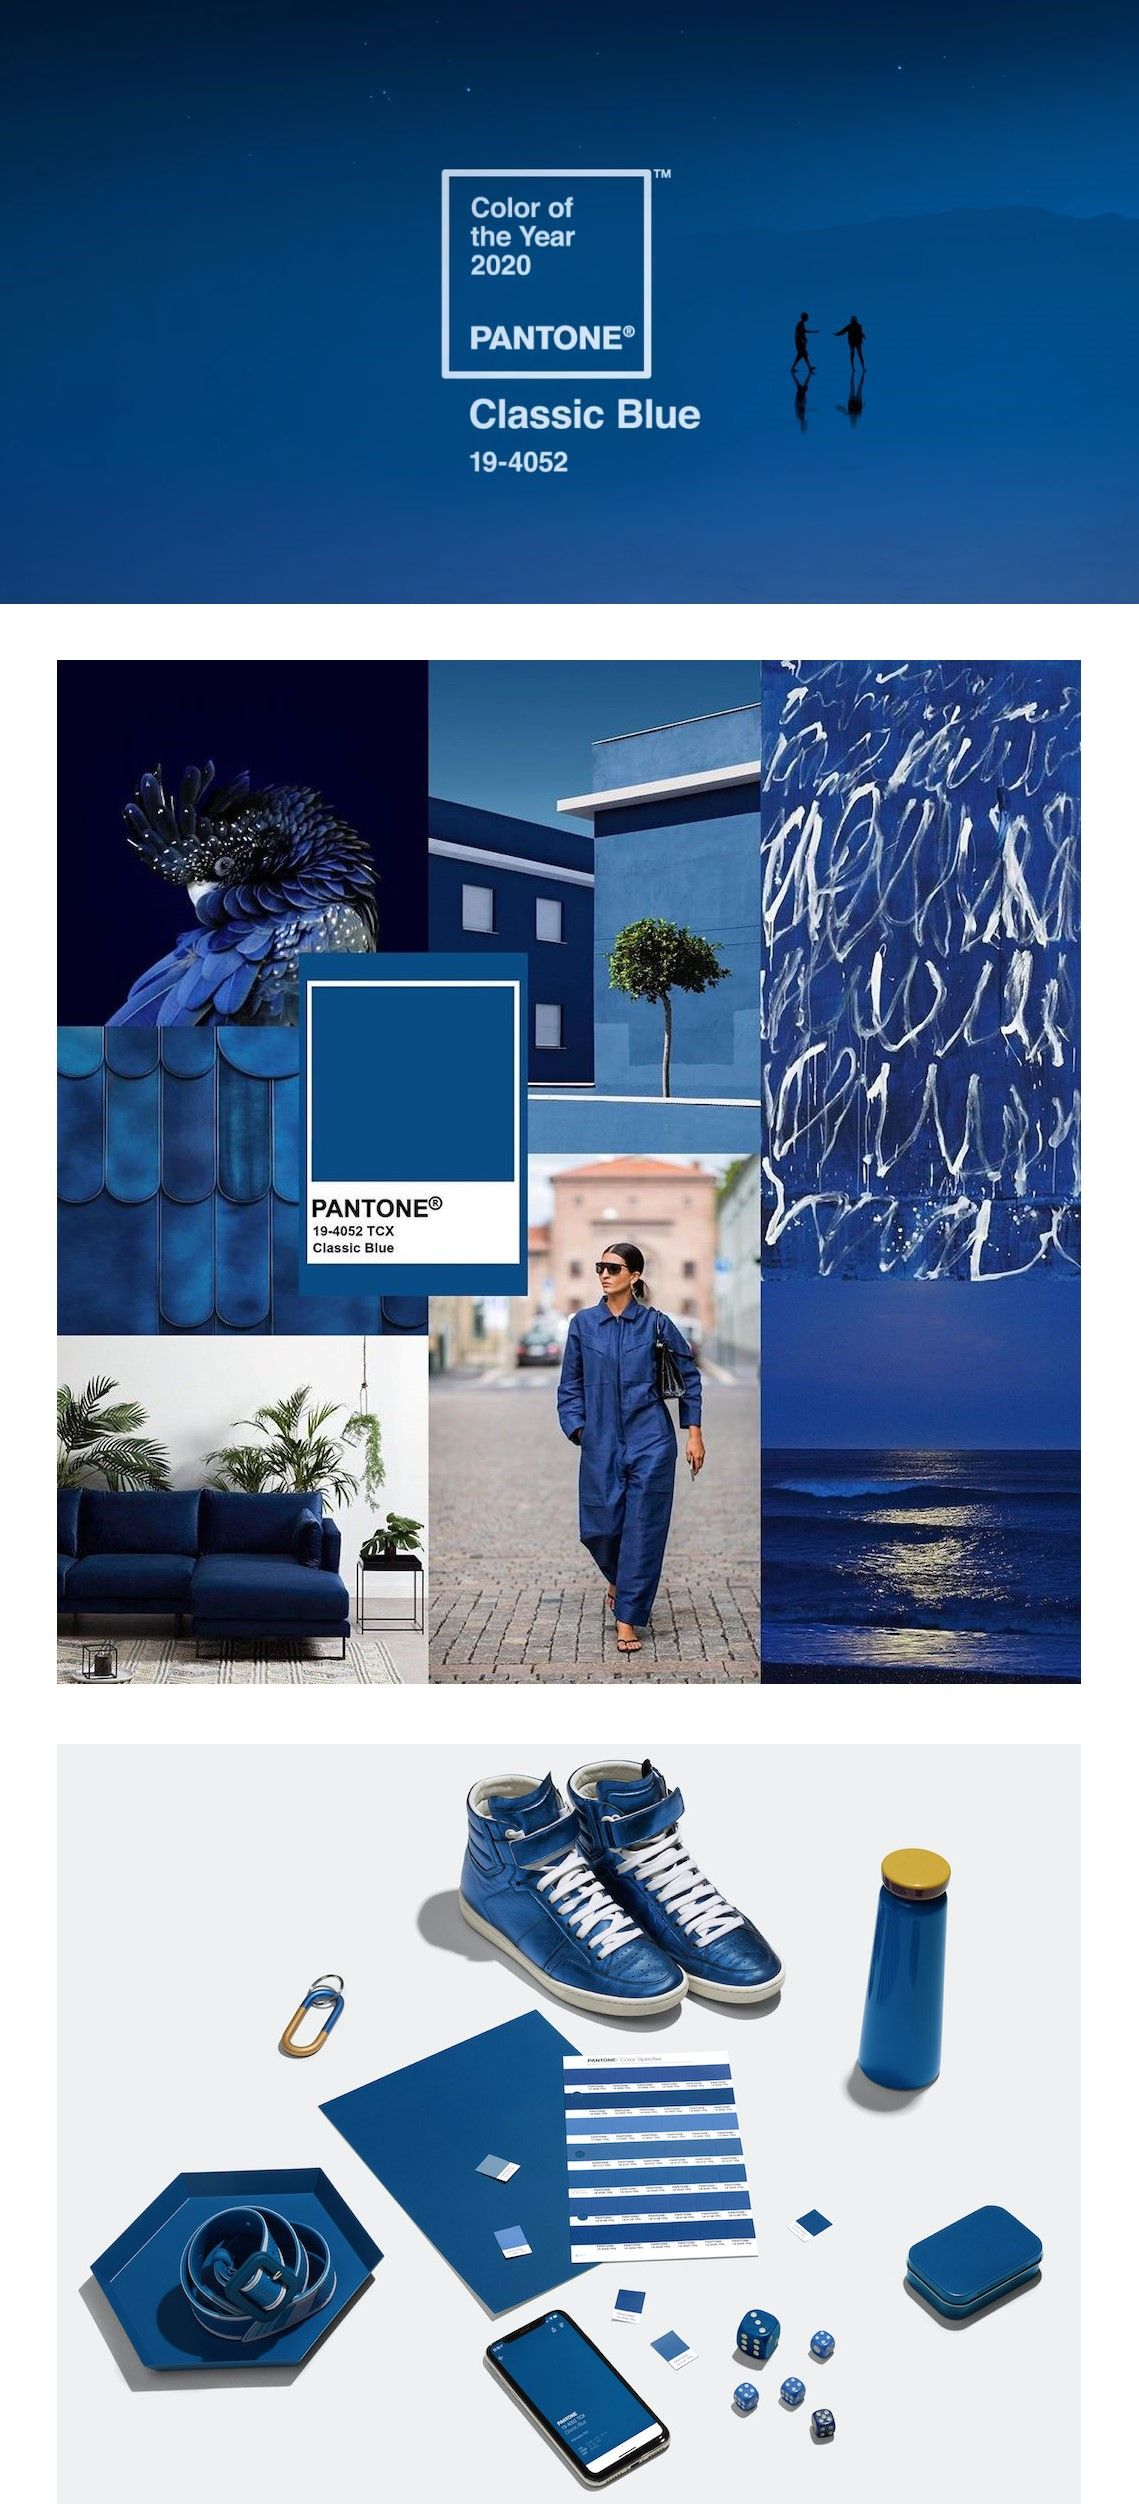 Colore Pantone 2020: Classic Blue 19-4052